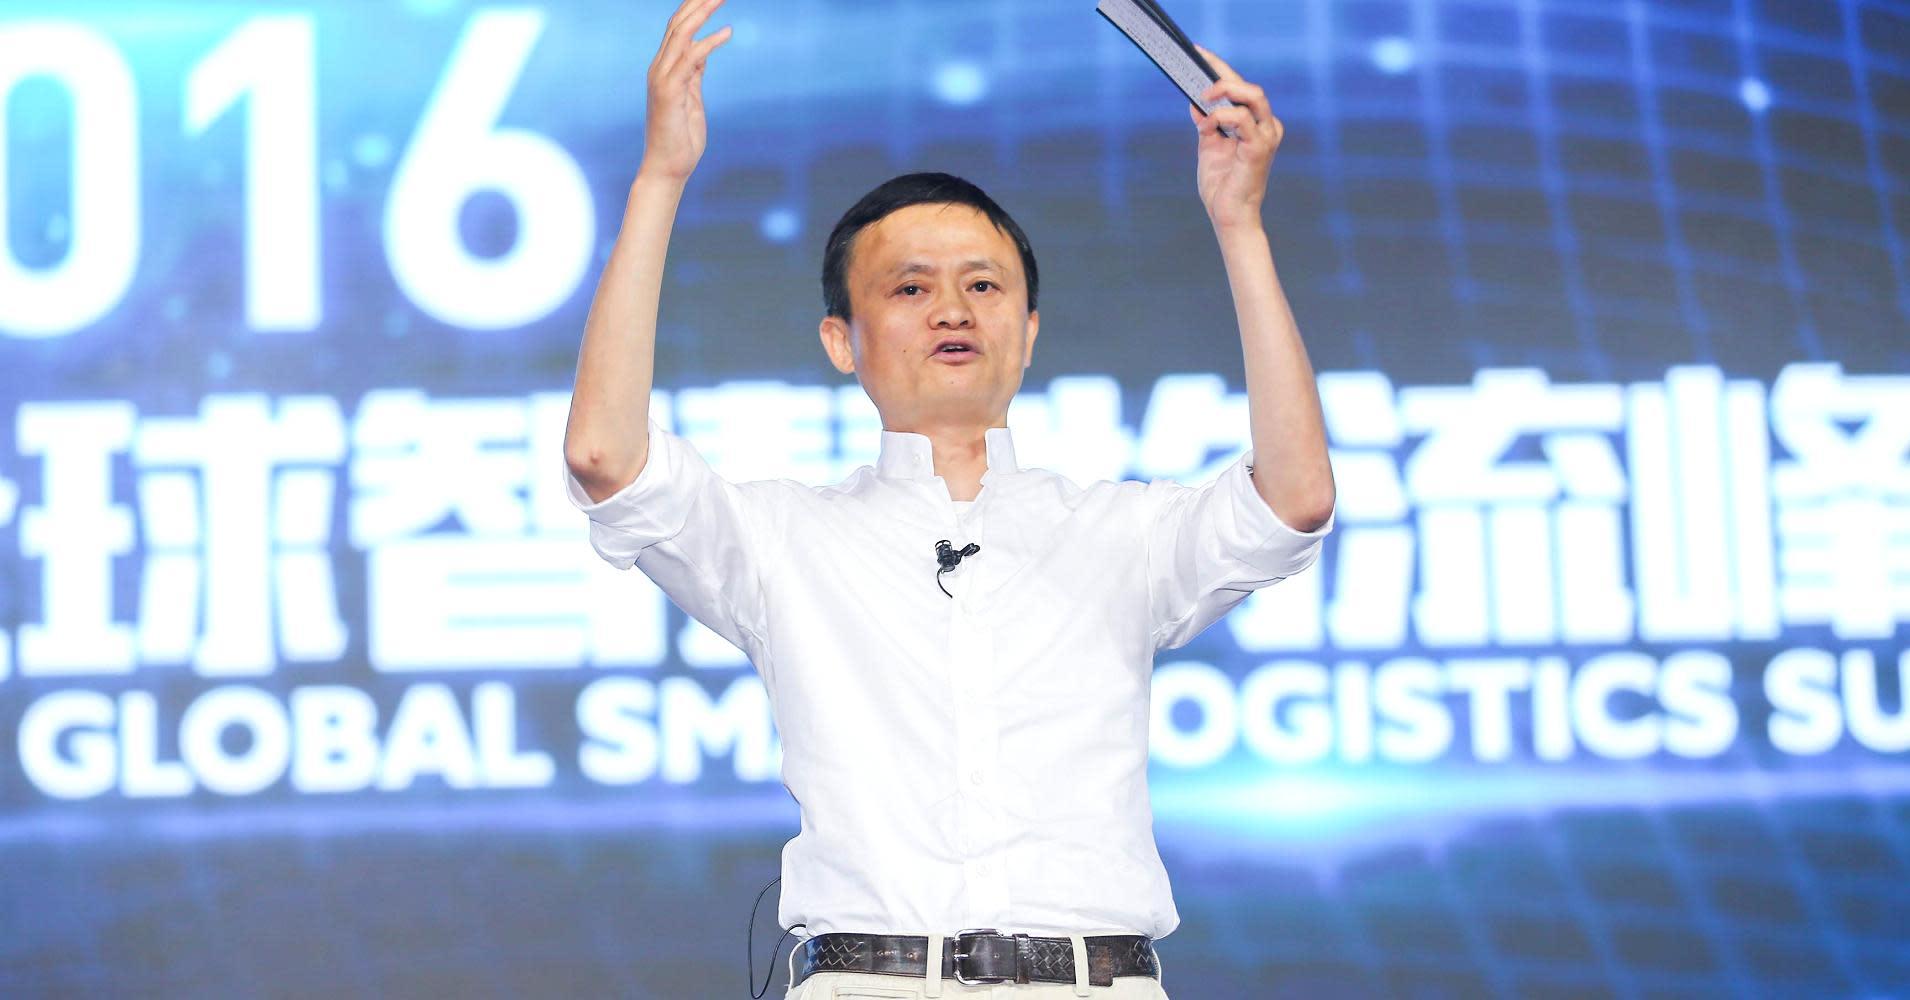 Alibaba Shares Climb After Morgan Stanley Raises Price Target